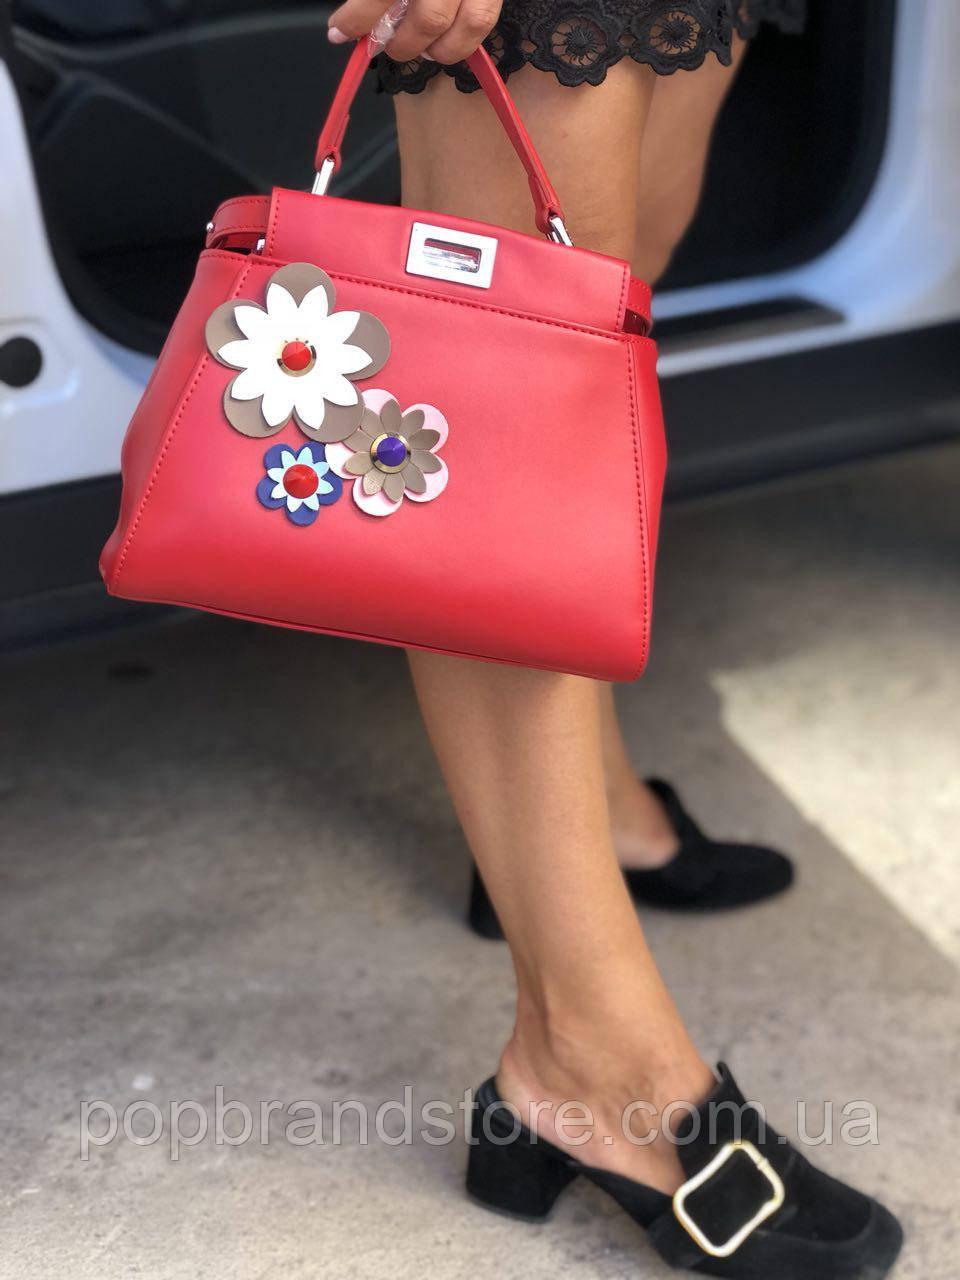 ecba17b4fde8 Стильная женская сумка FENDI PEEKABOO красная (реплика) - Pop Brand Store |  брендовые сумки